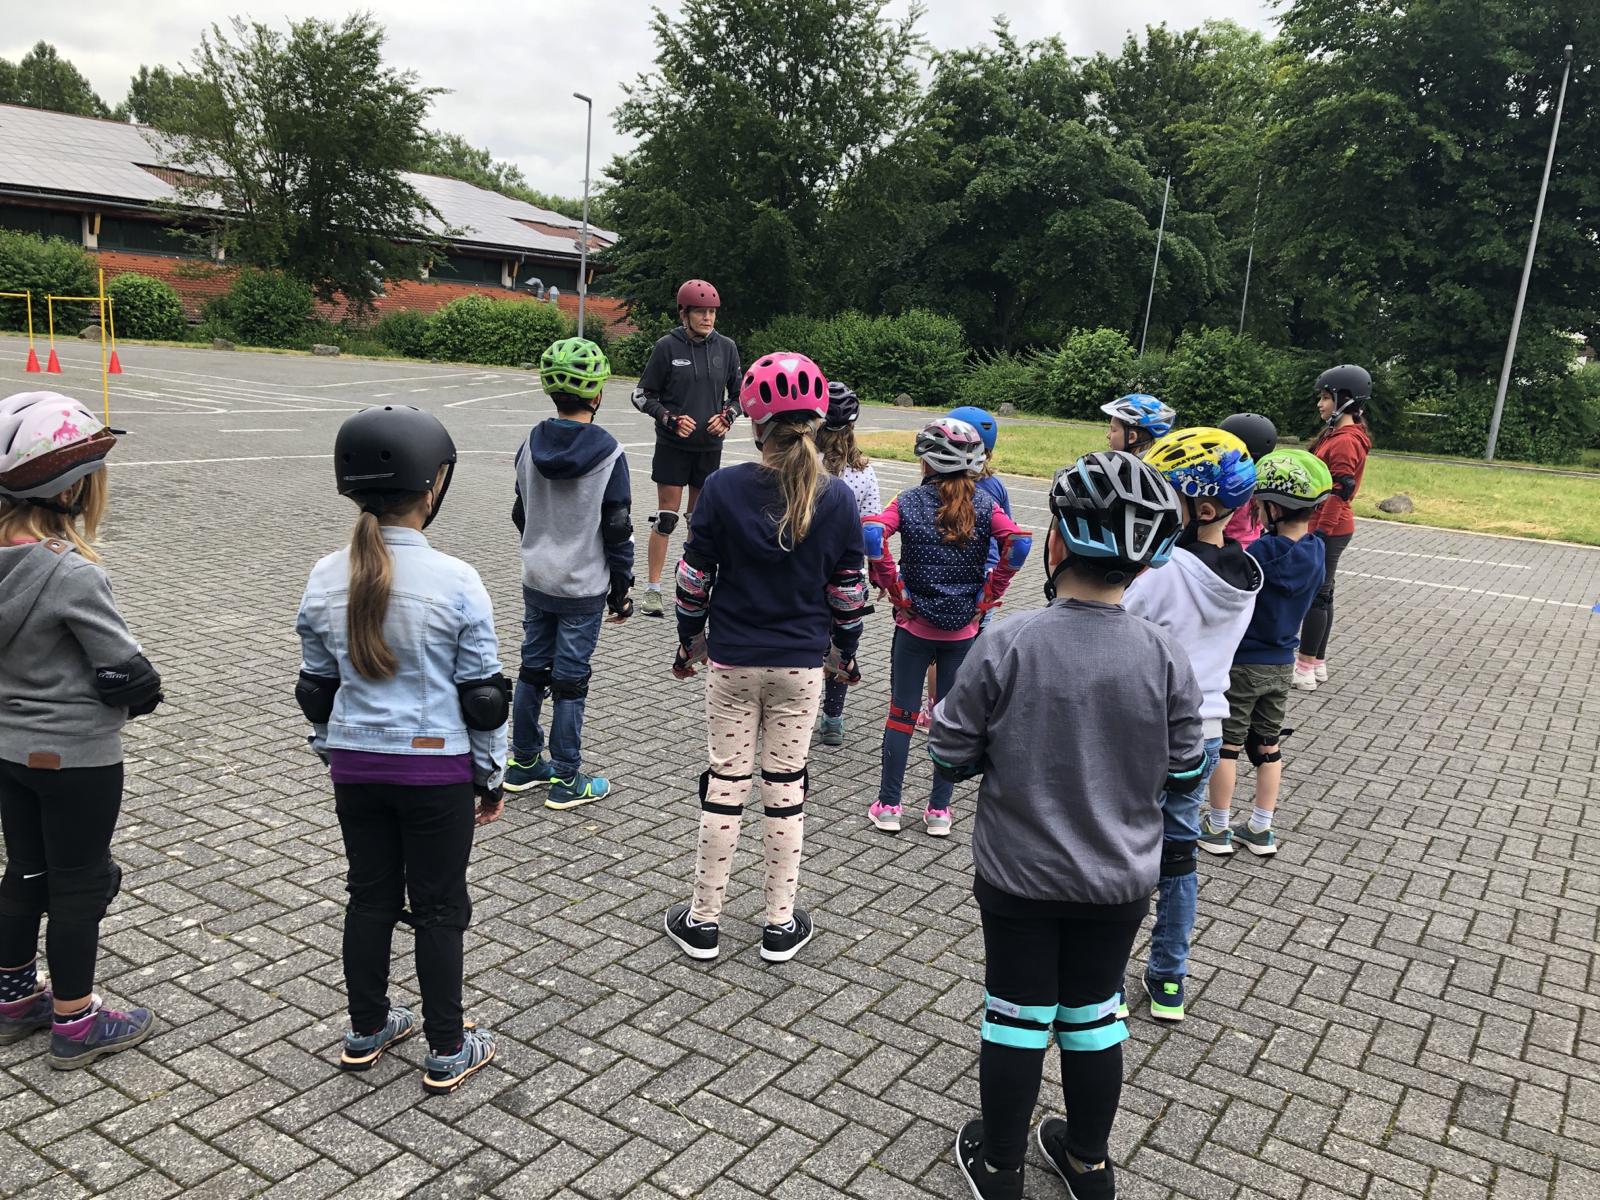 Remagener Skateschool bringt die Gelsdorfer Grundschüler ins Rollen